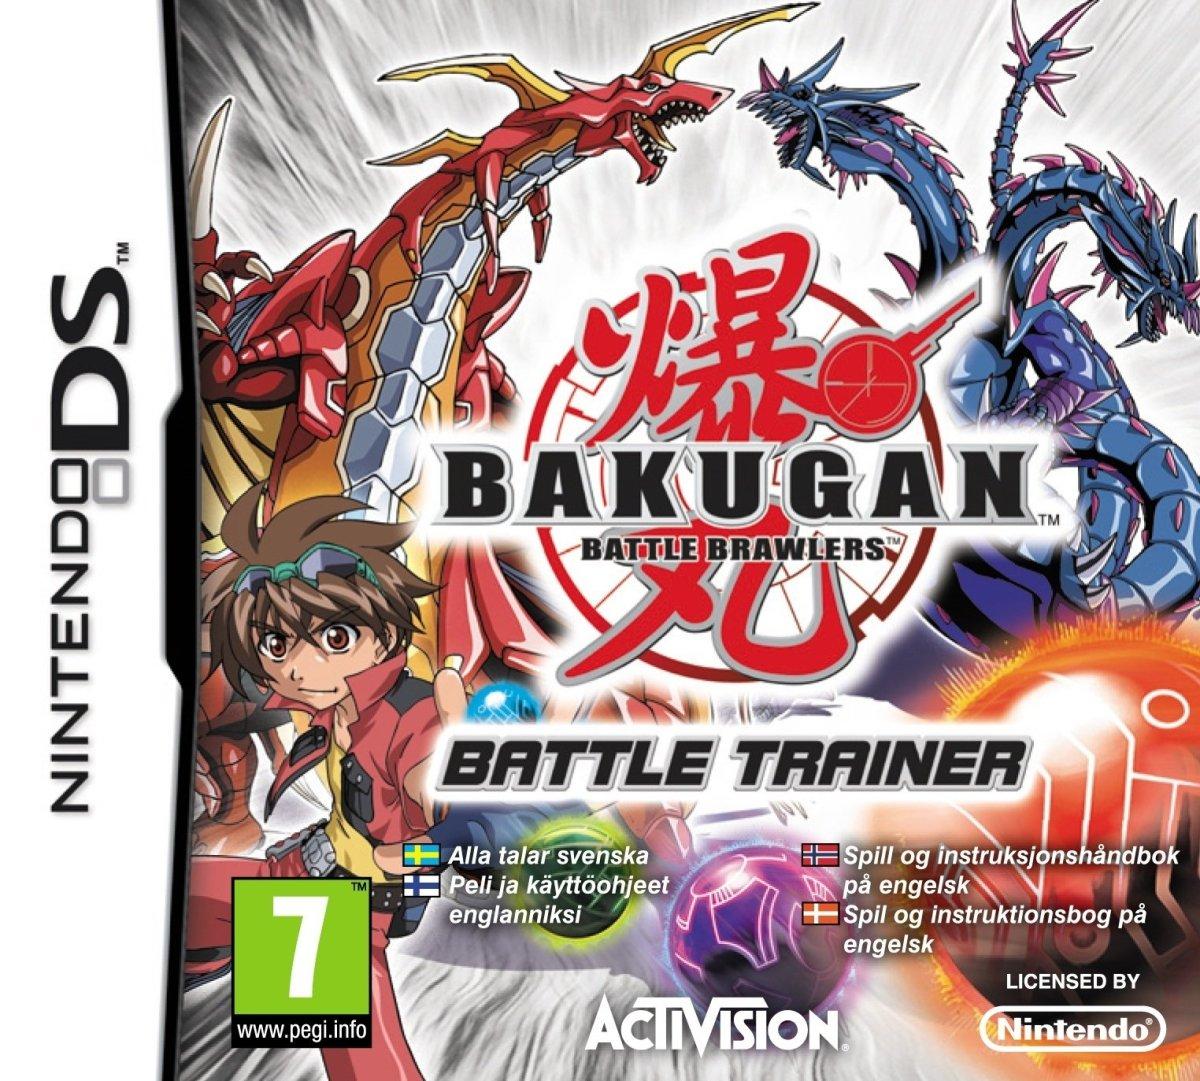 Bakugan: Battle Brawlers - Battle Trainer